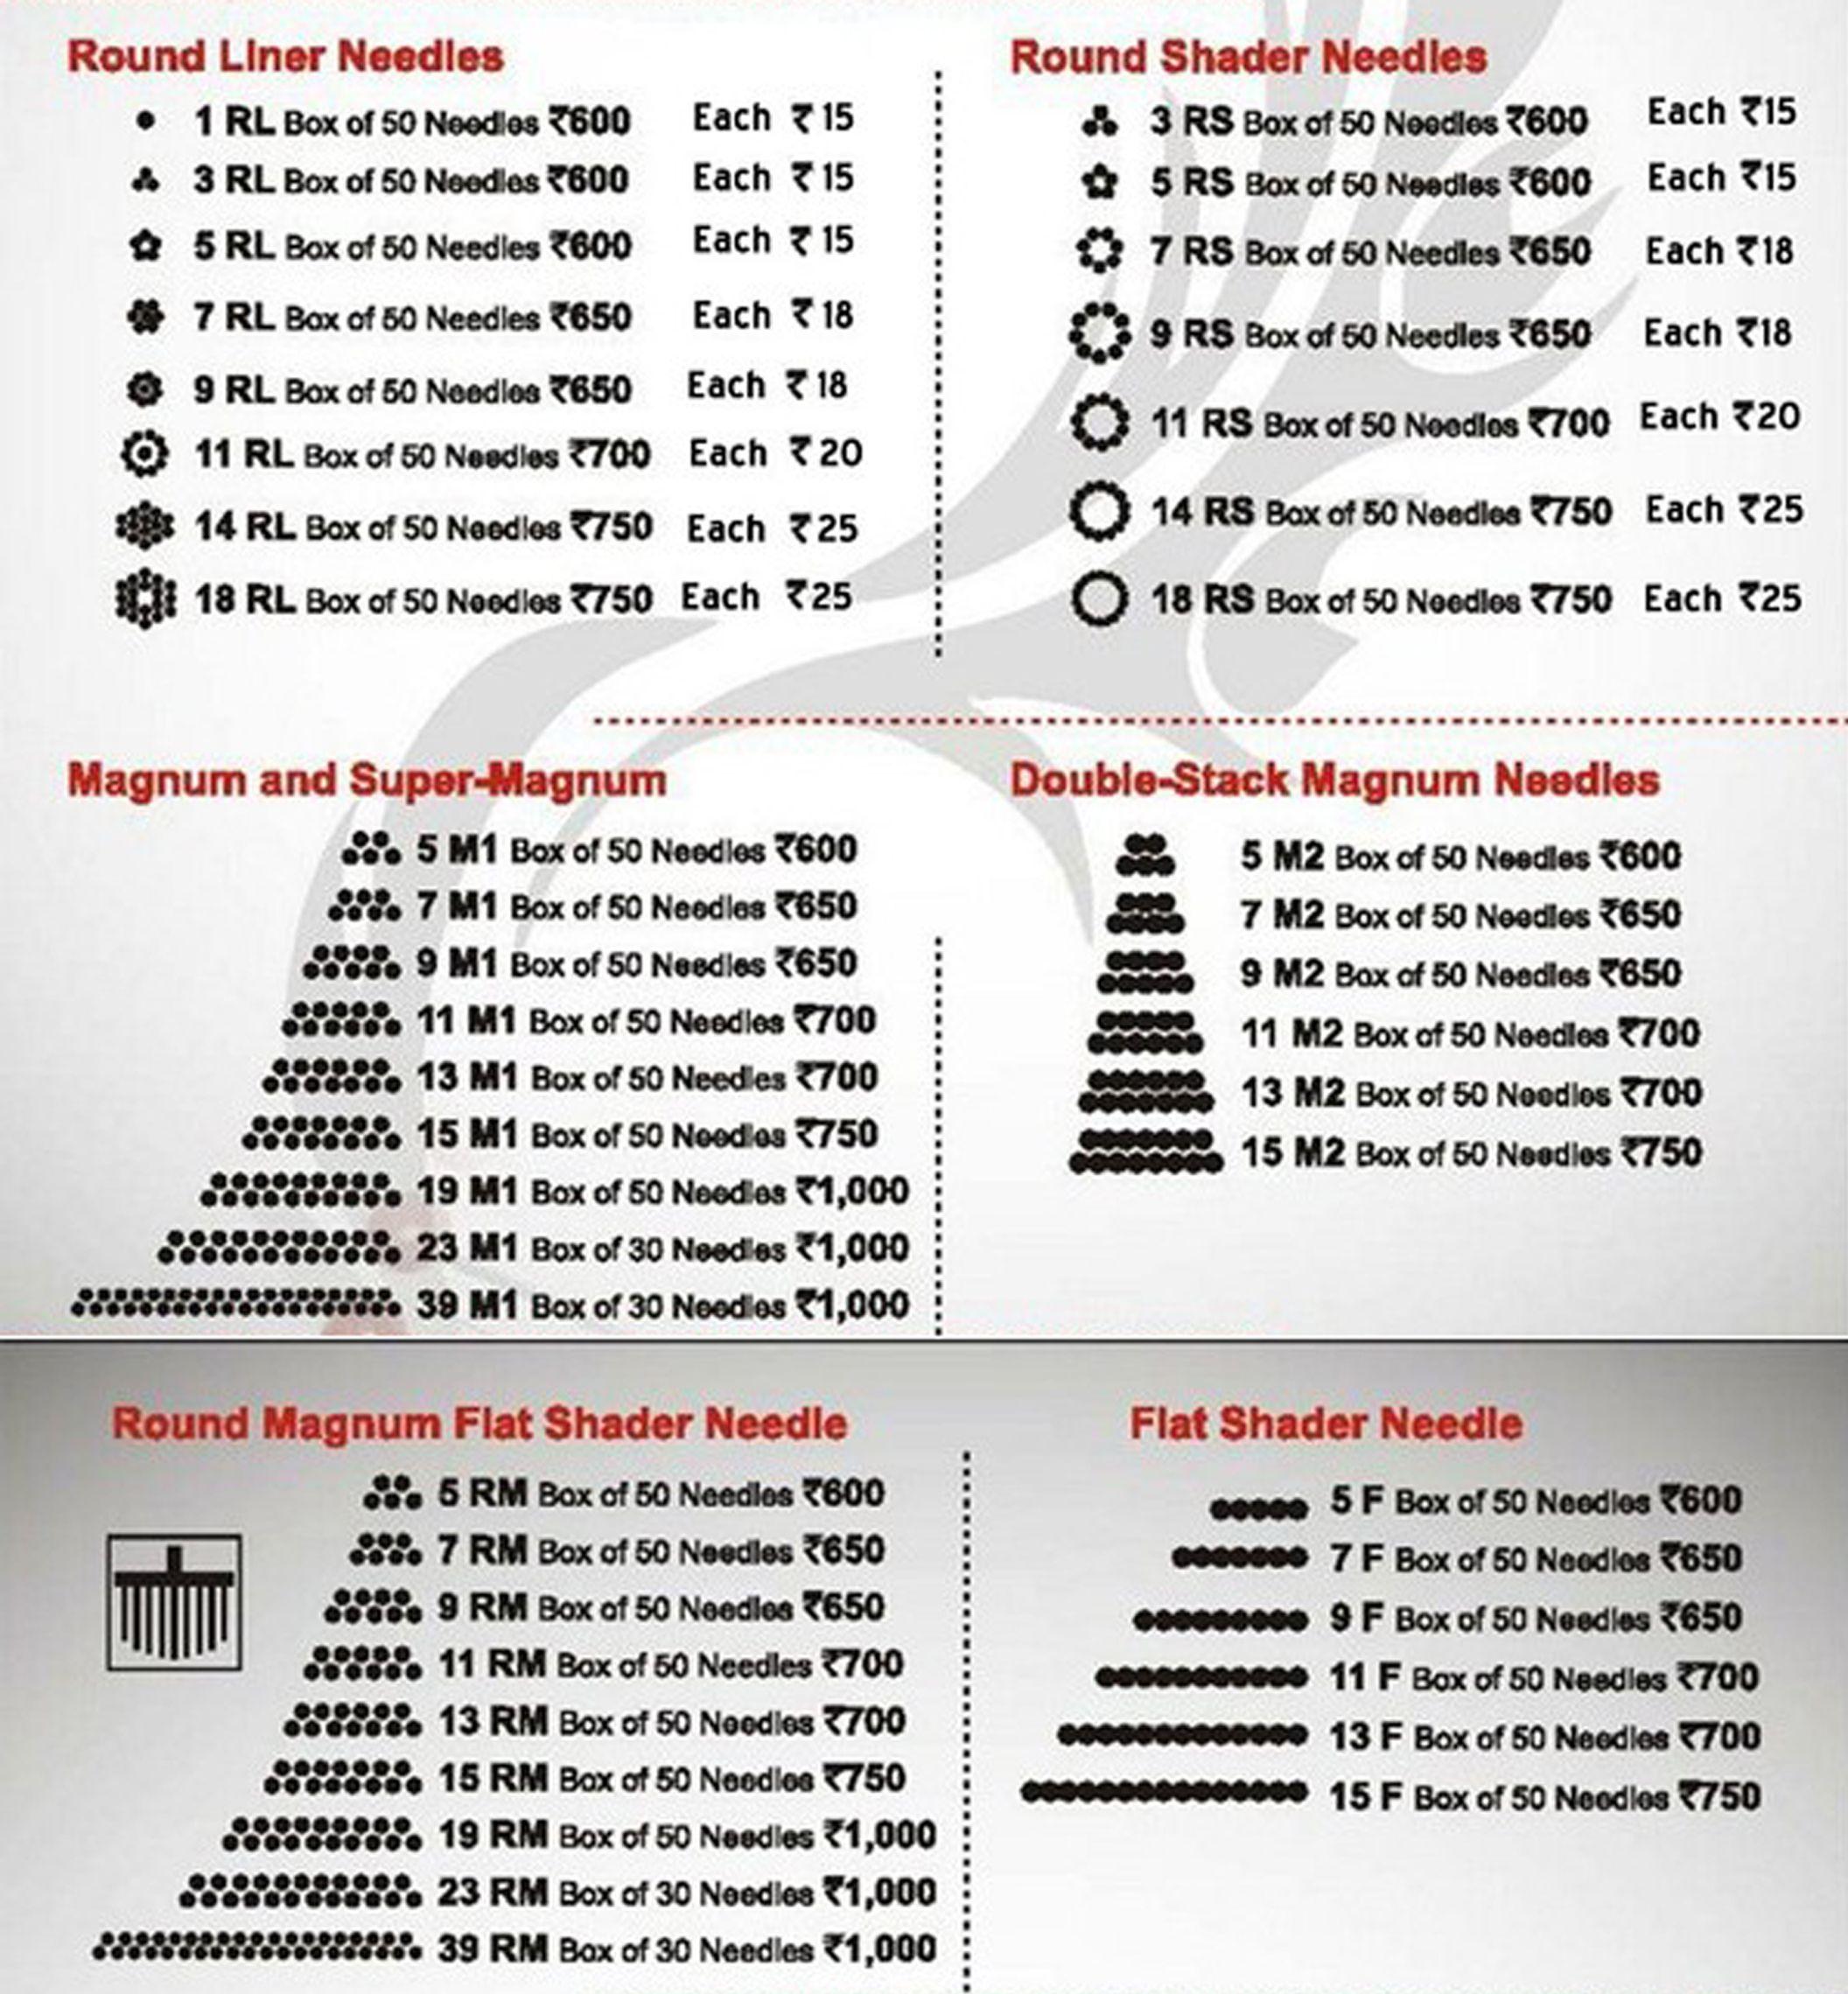 Agujas M1 M2 RS RL RM Y F | Tattoo, Tatto and Tatoos